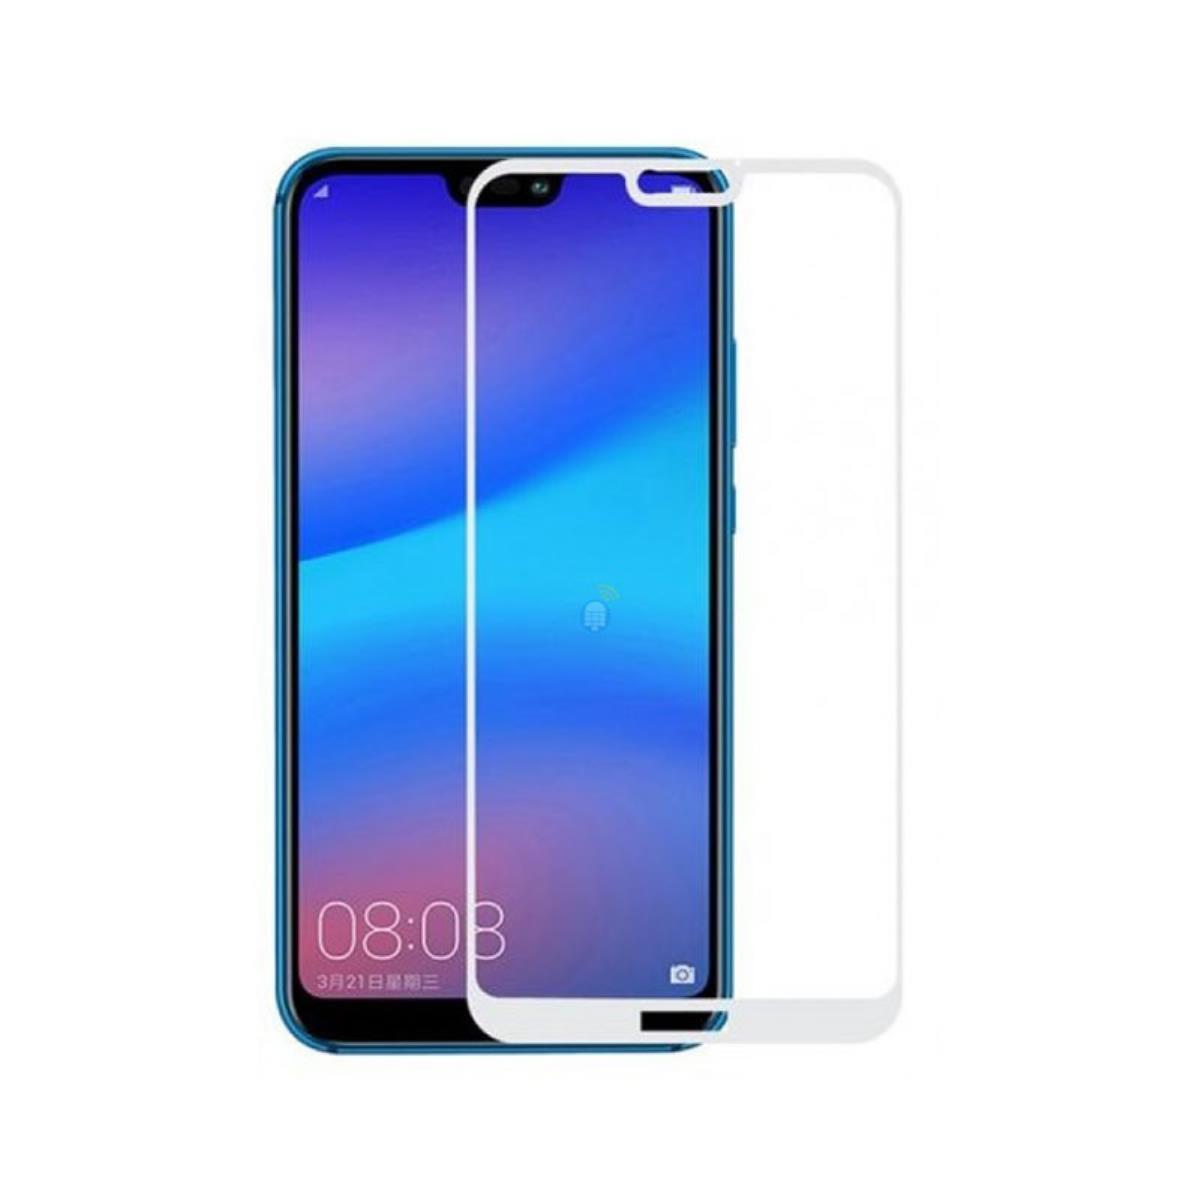 NOKIA 3310 3G DUAL SIM DARK BLUE